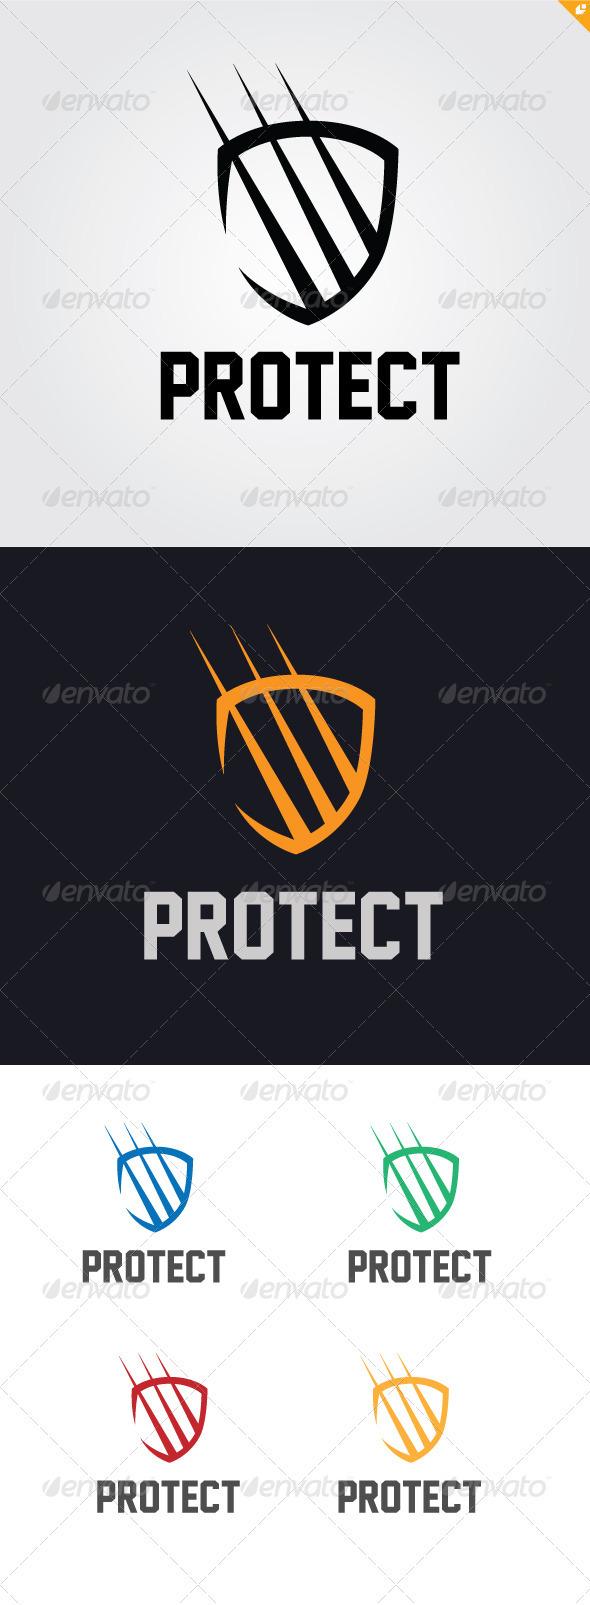 GraphicRiver Protect Logo 3361748